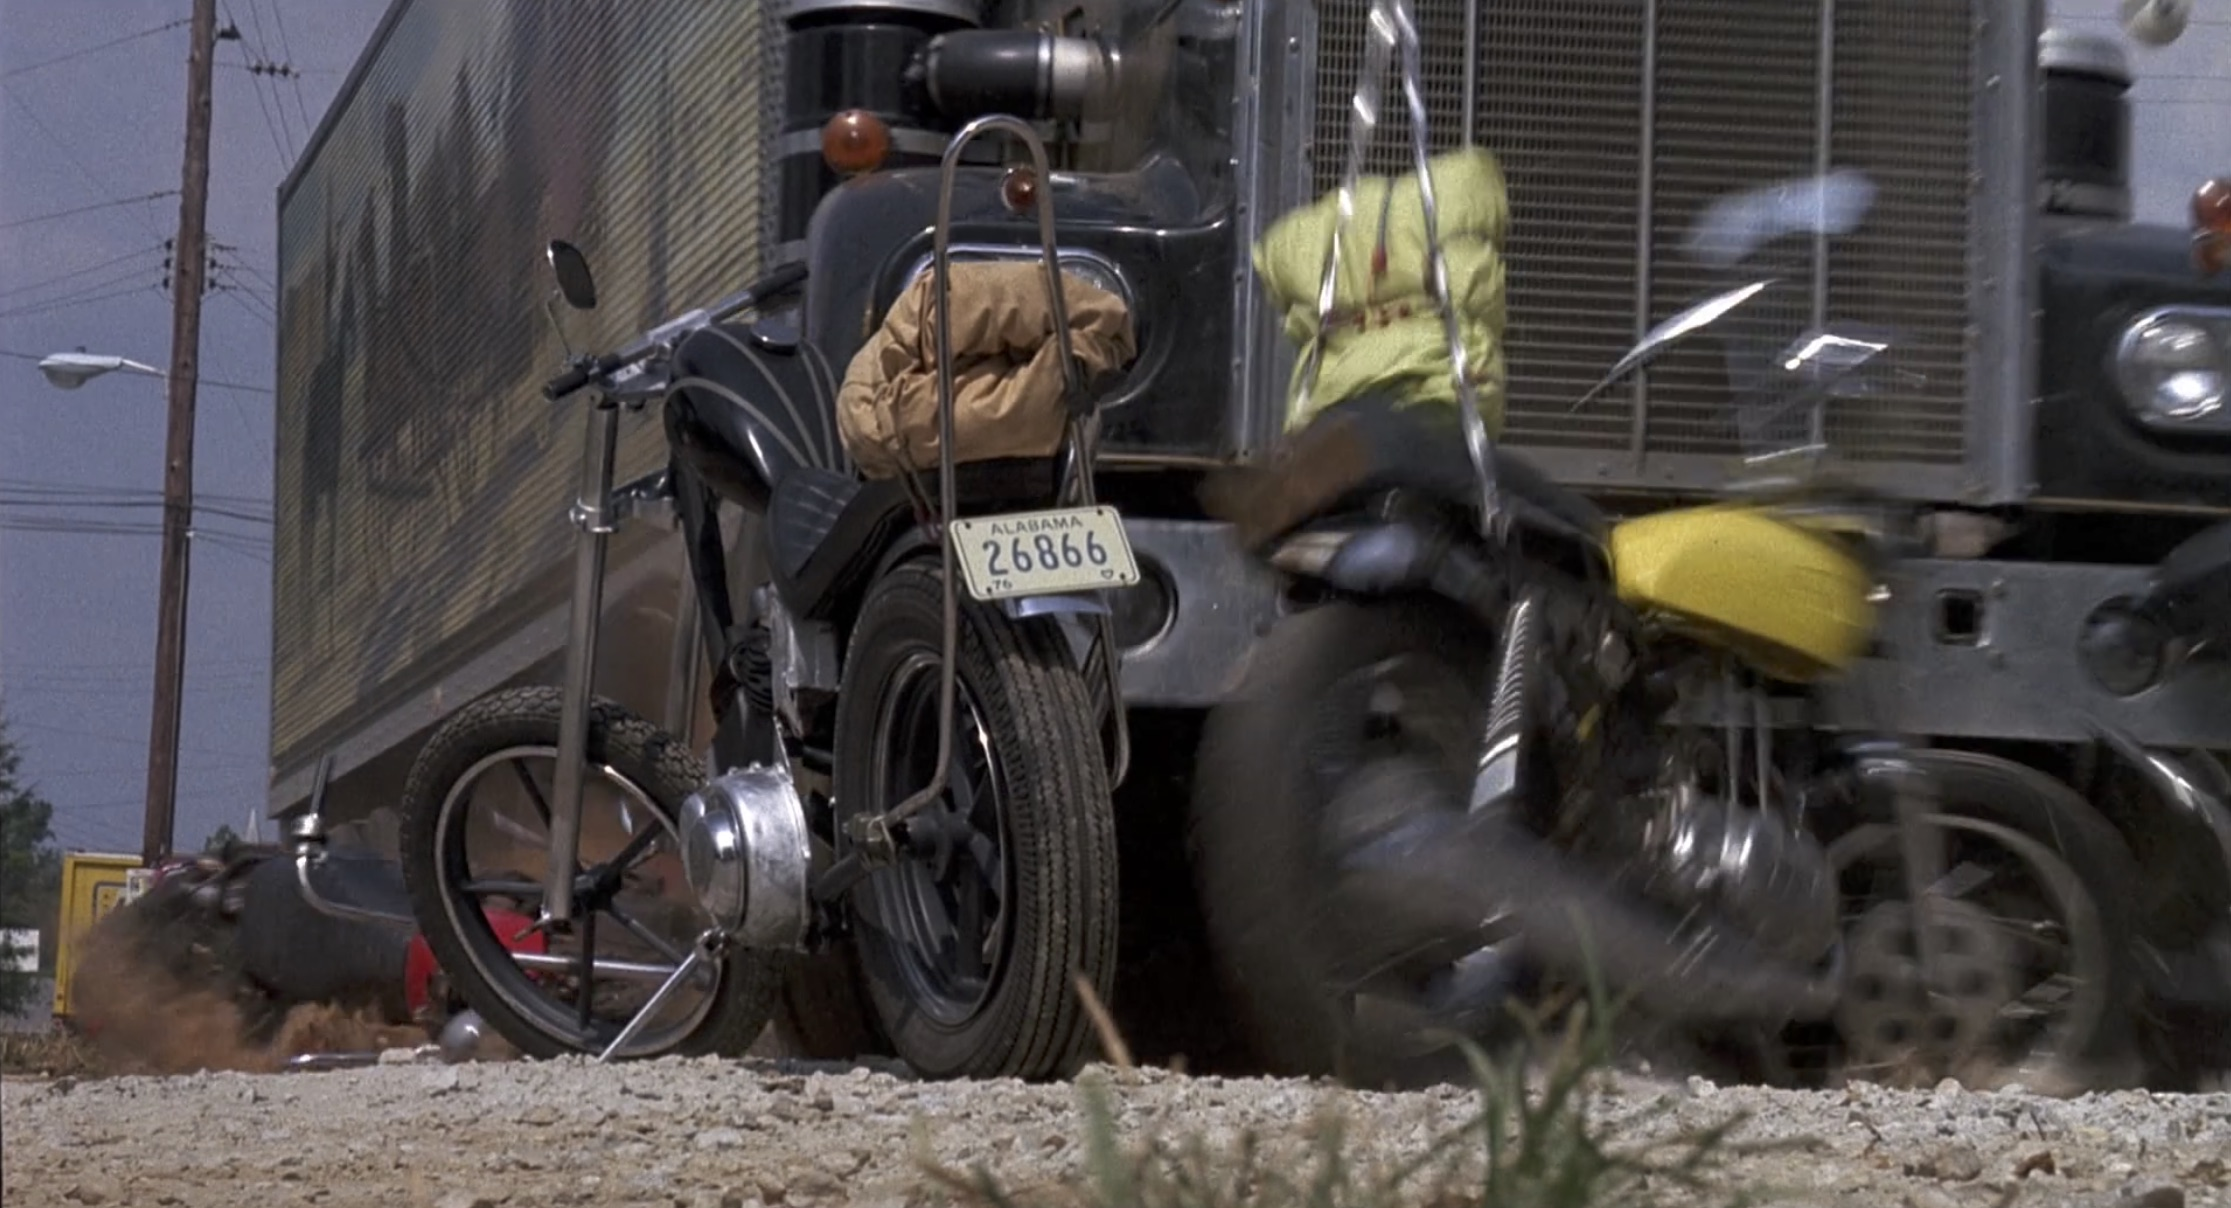 Smokey and the bandit semi hits bikes